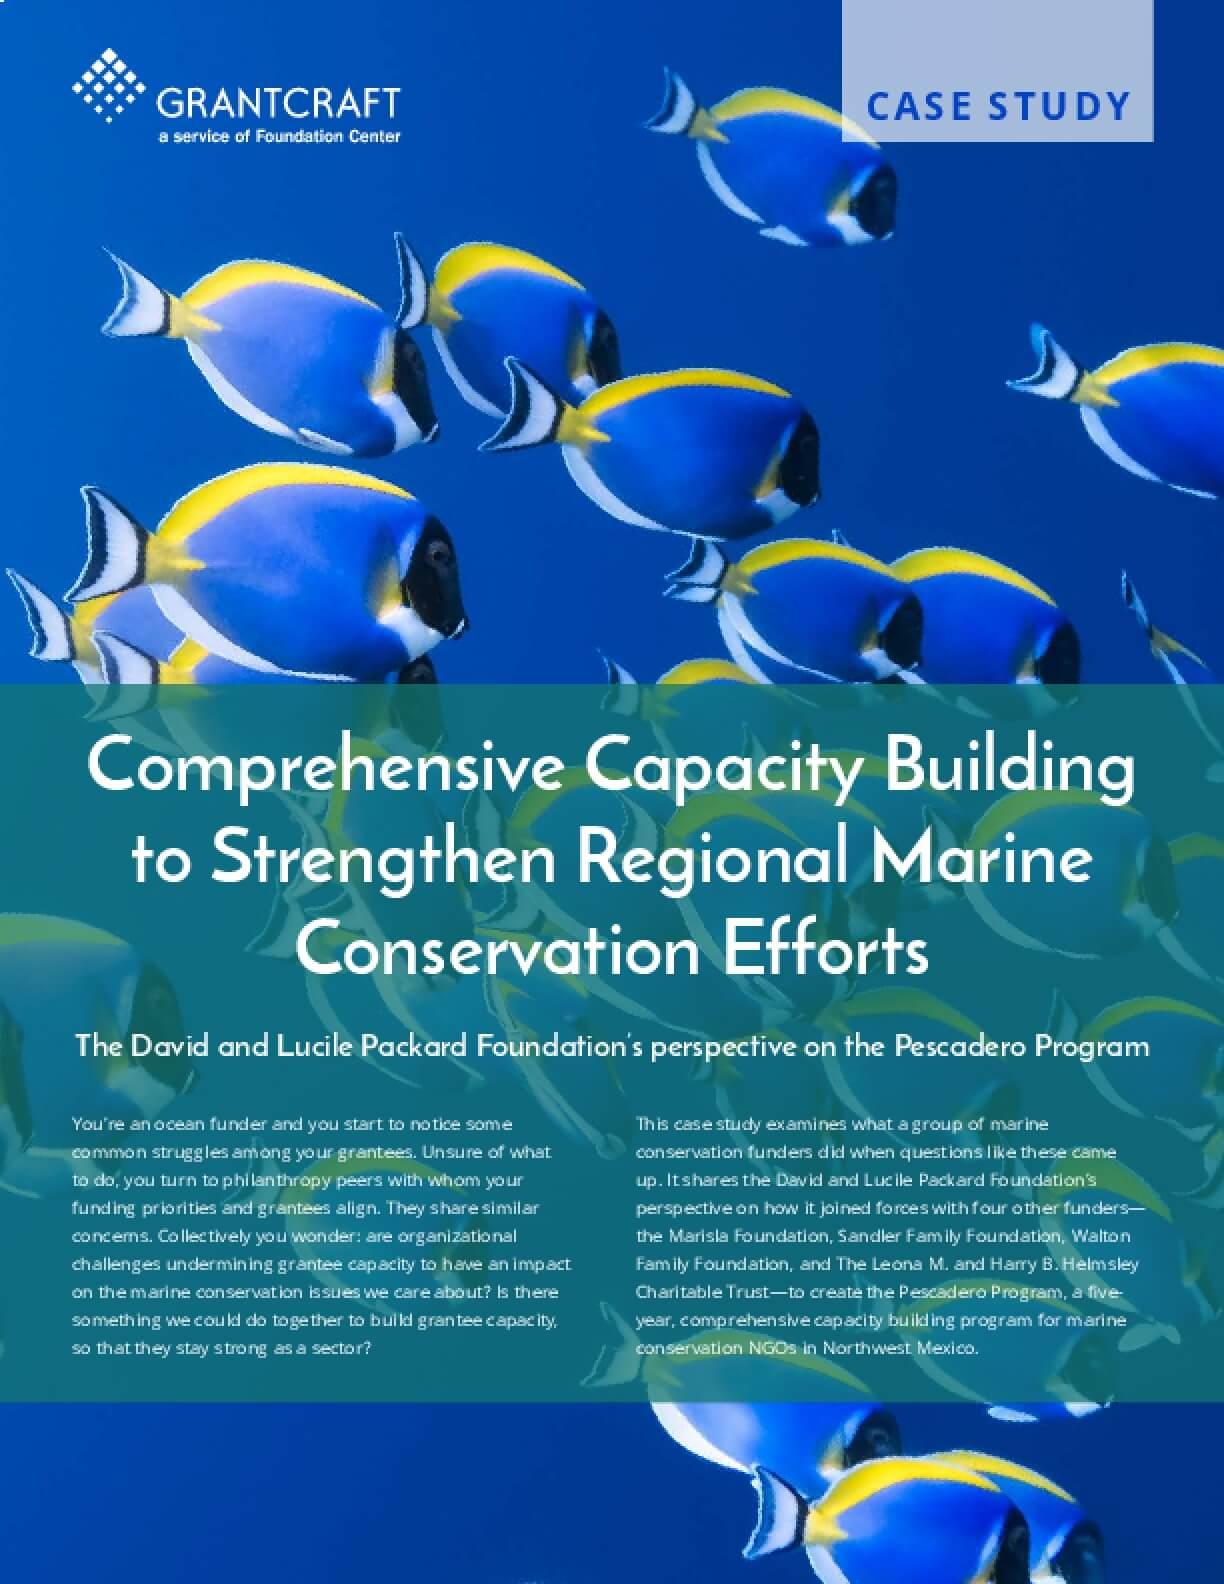 Comprehensive Capacity Building to Strengthen Regional Marine Conservation Efforts